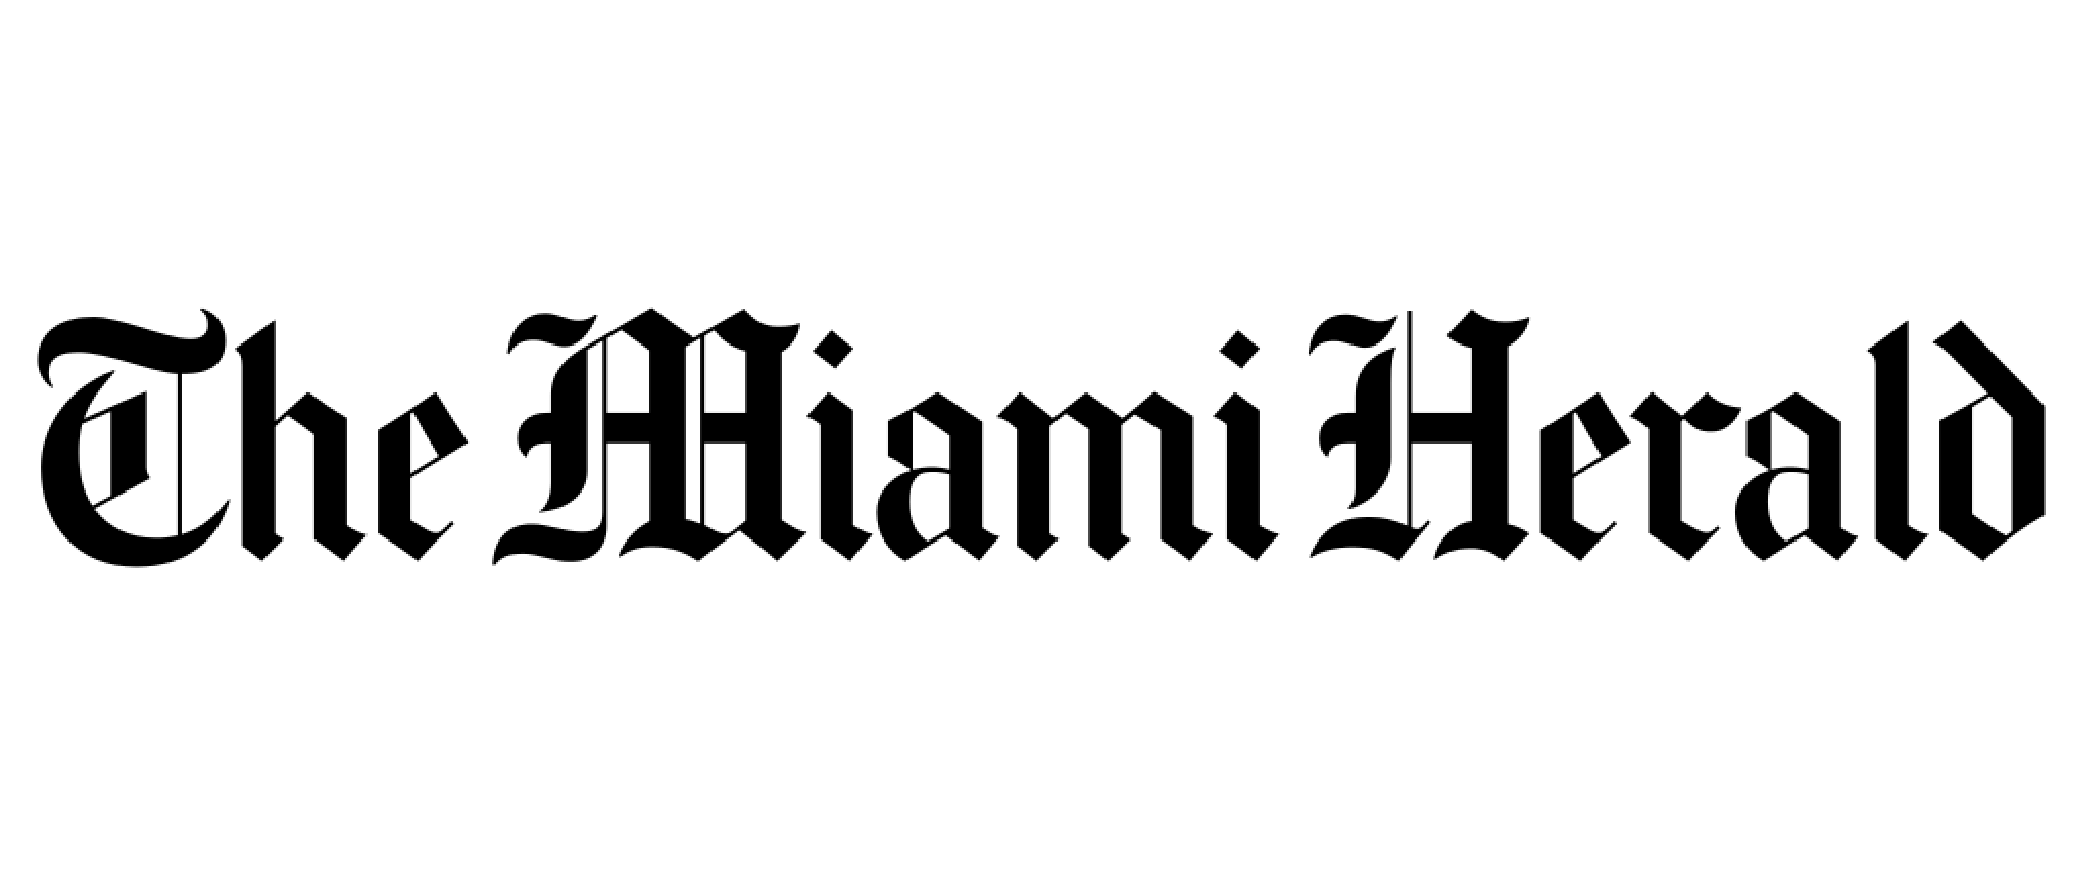 Miami Herald logo.png